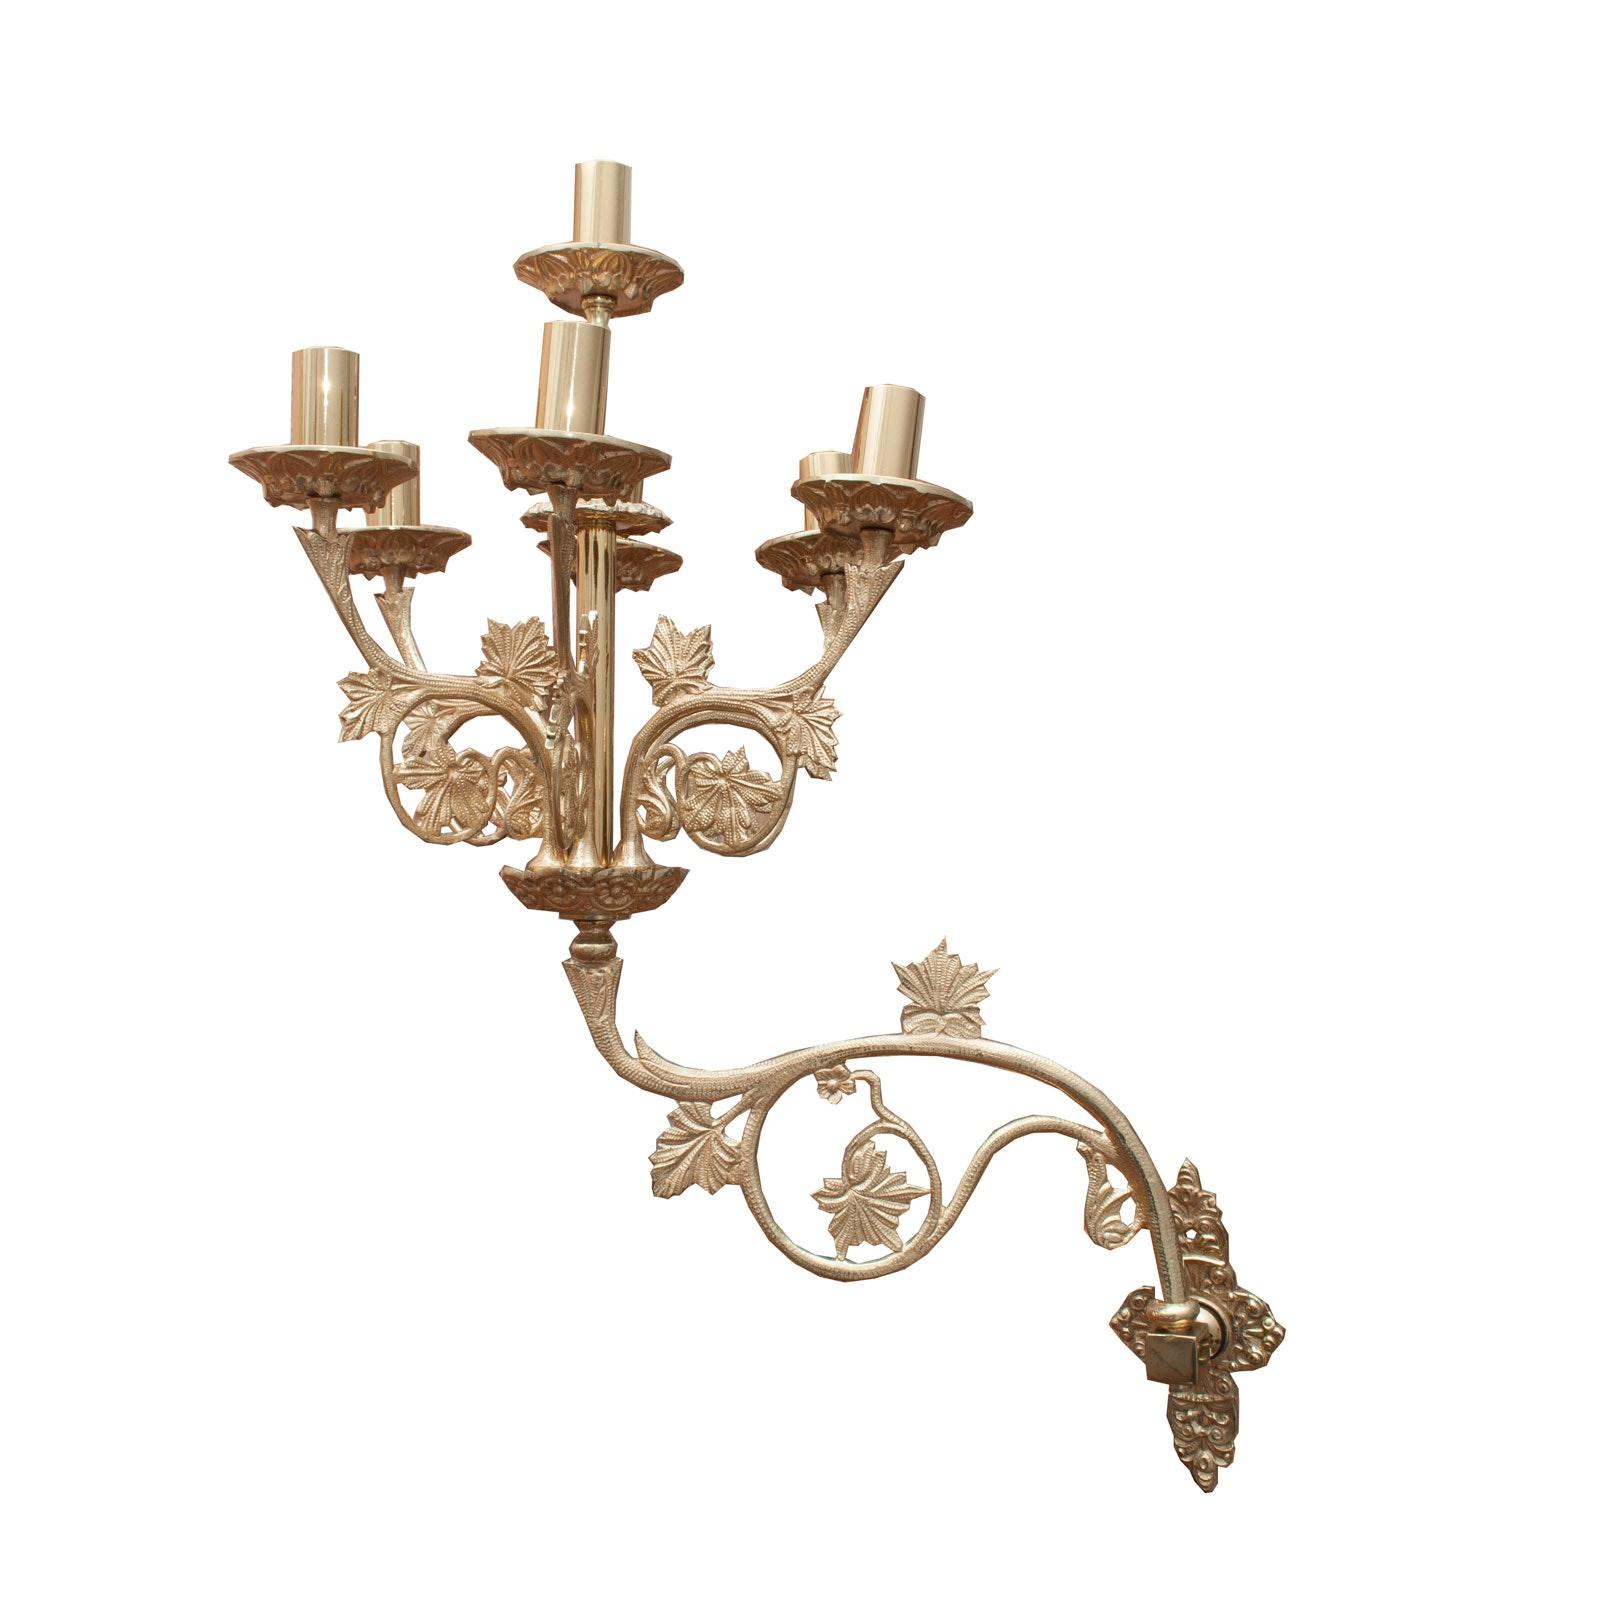 Ornate Leaf Brass Candelabra Wall Sconce